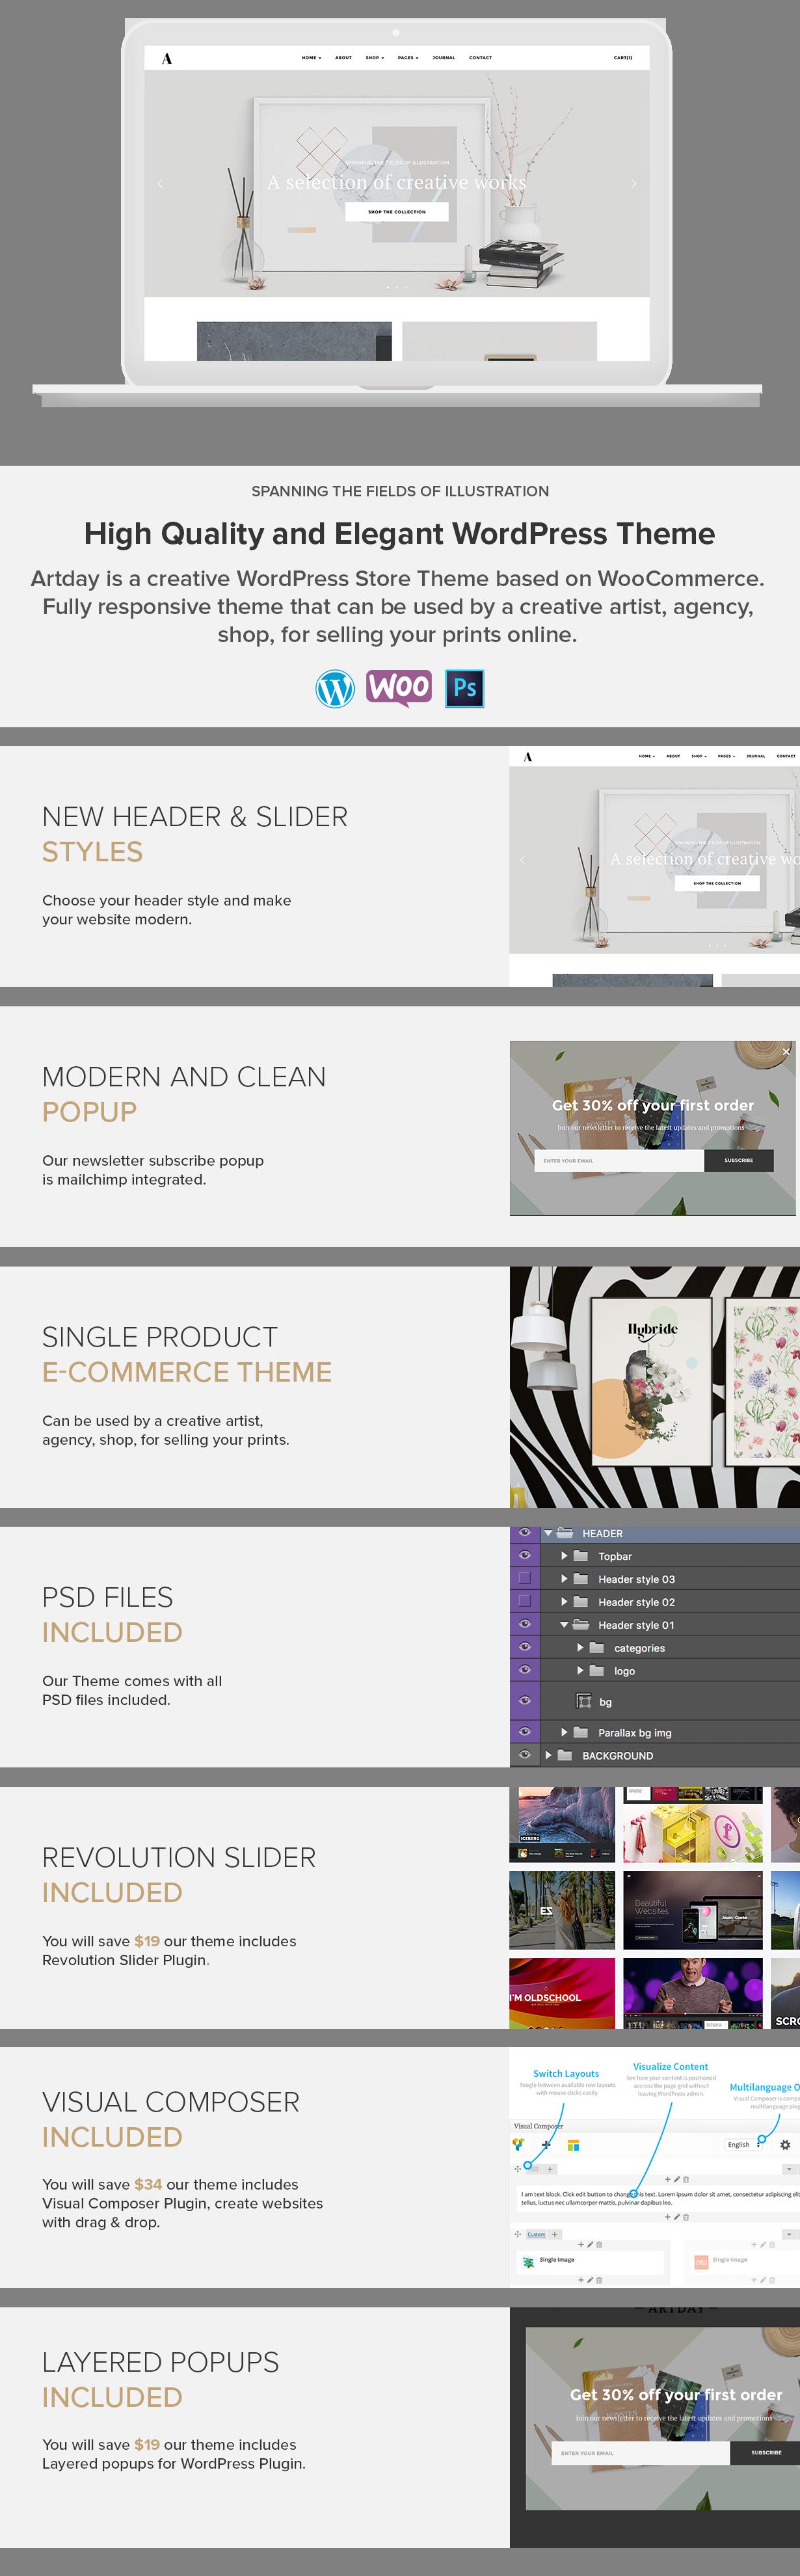 artday preview 02 - Artday - Creative Artist WordPress Shop